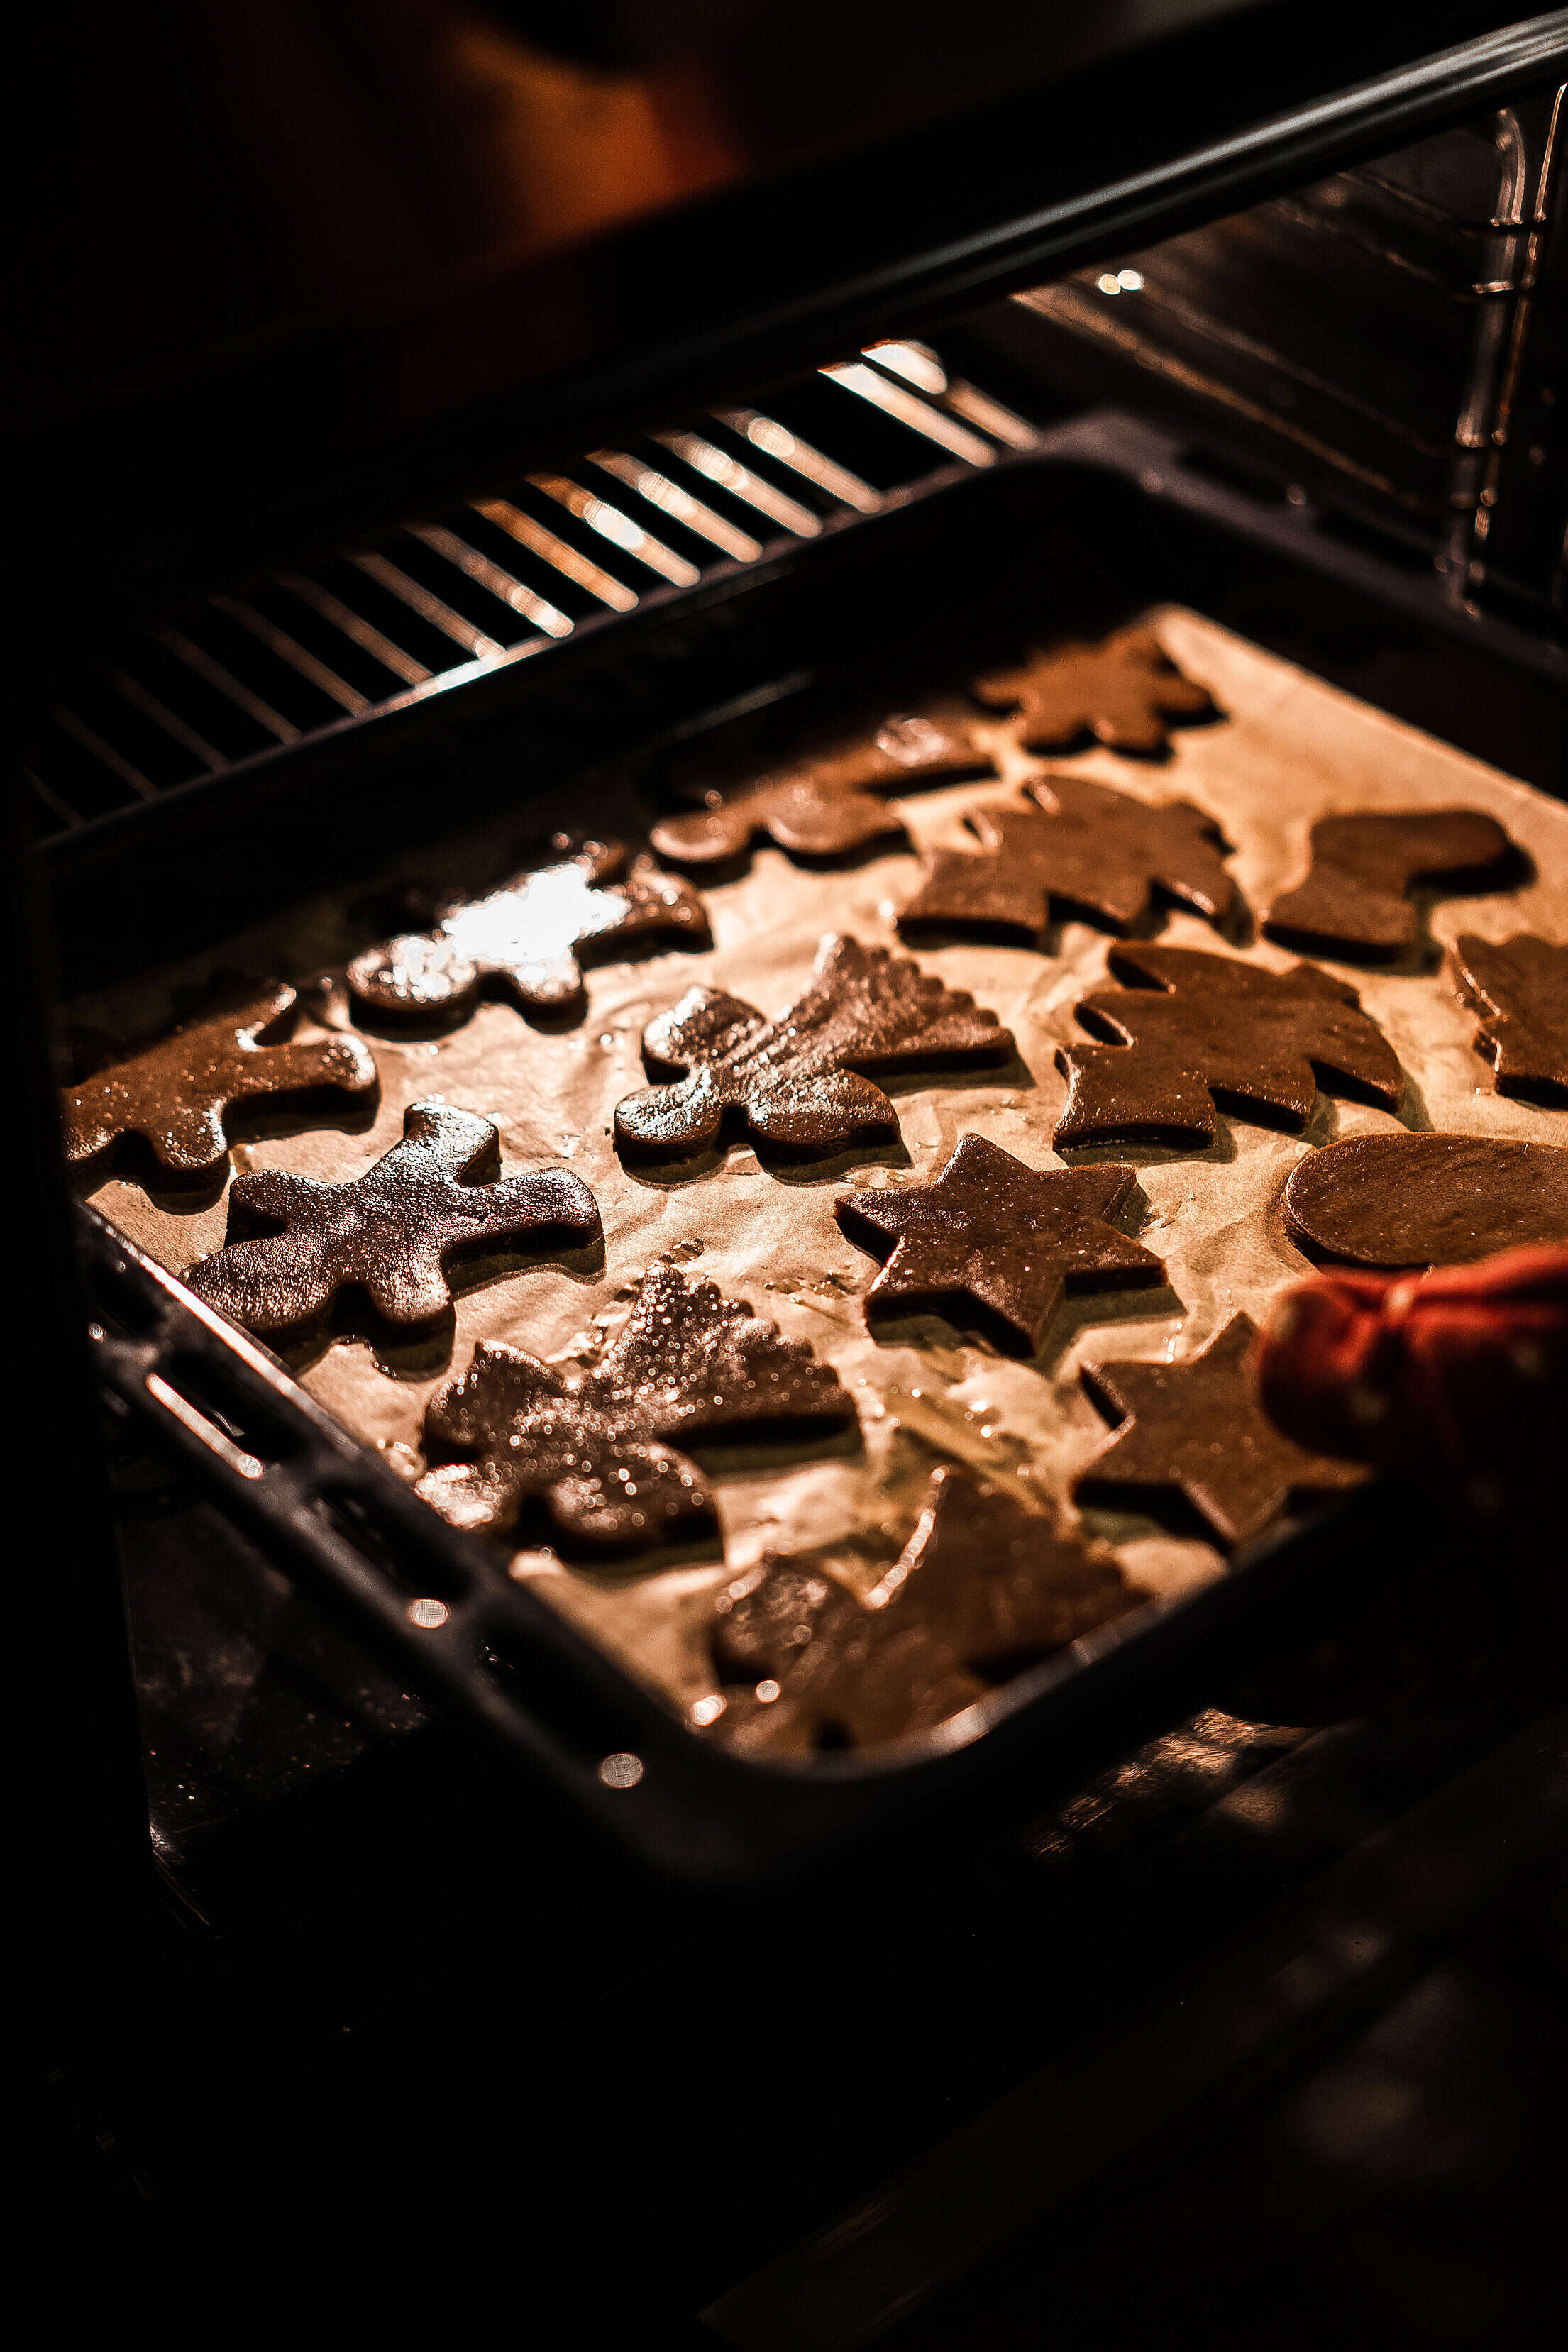 Baking Gingerbread Cookies Free Stock Photo